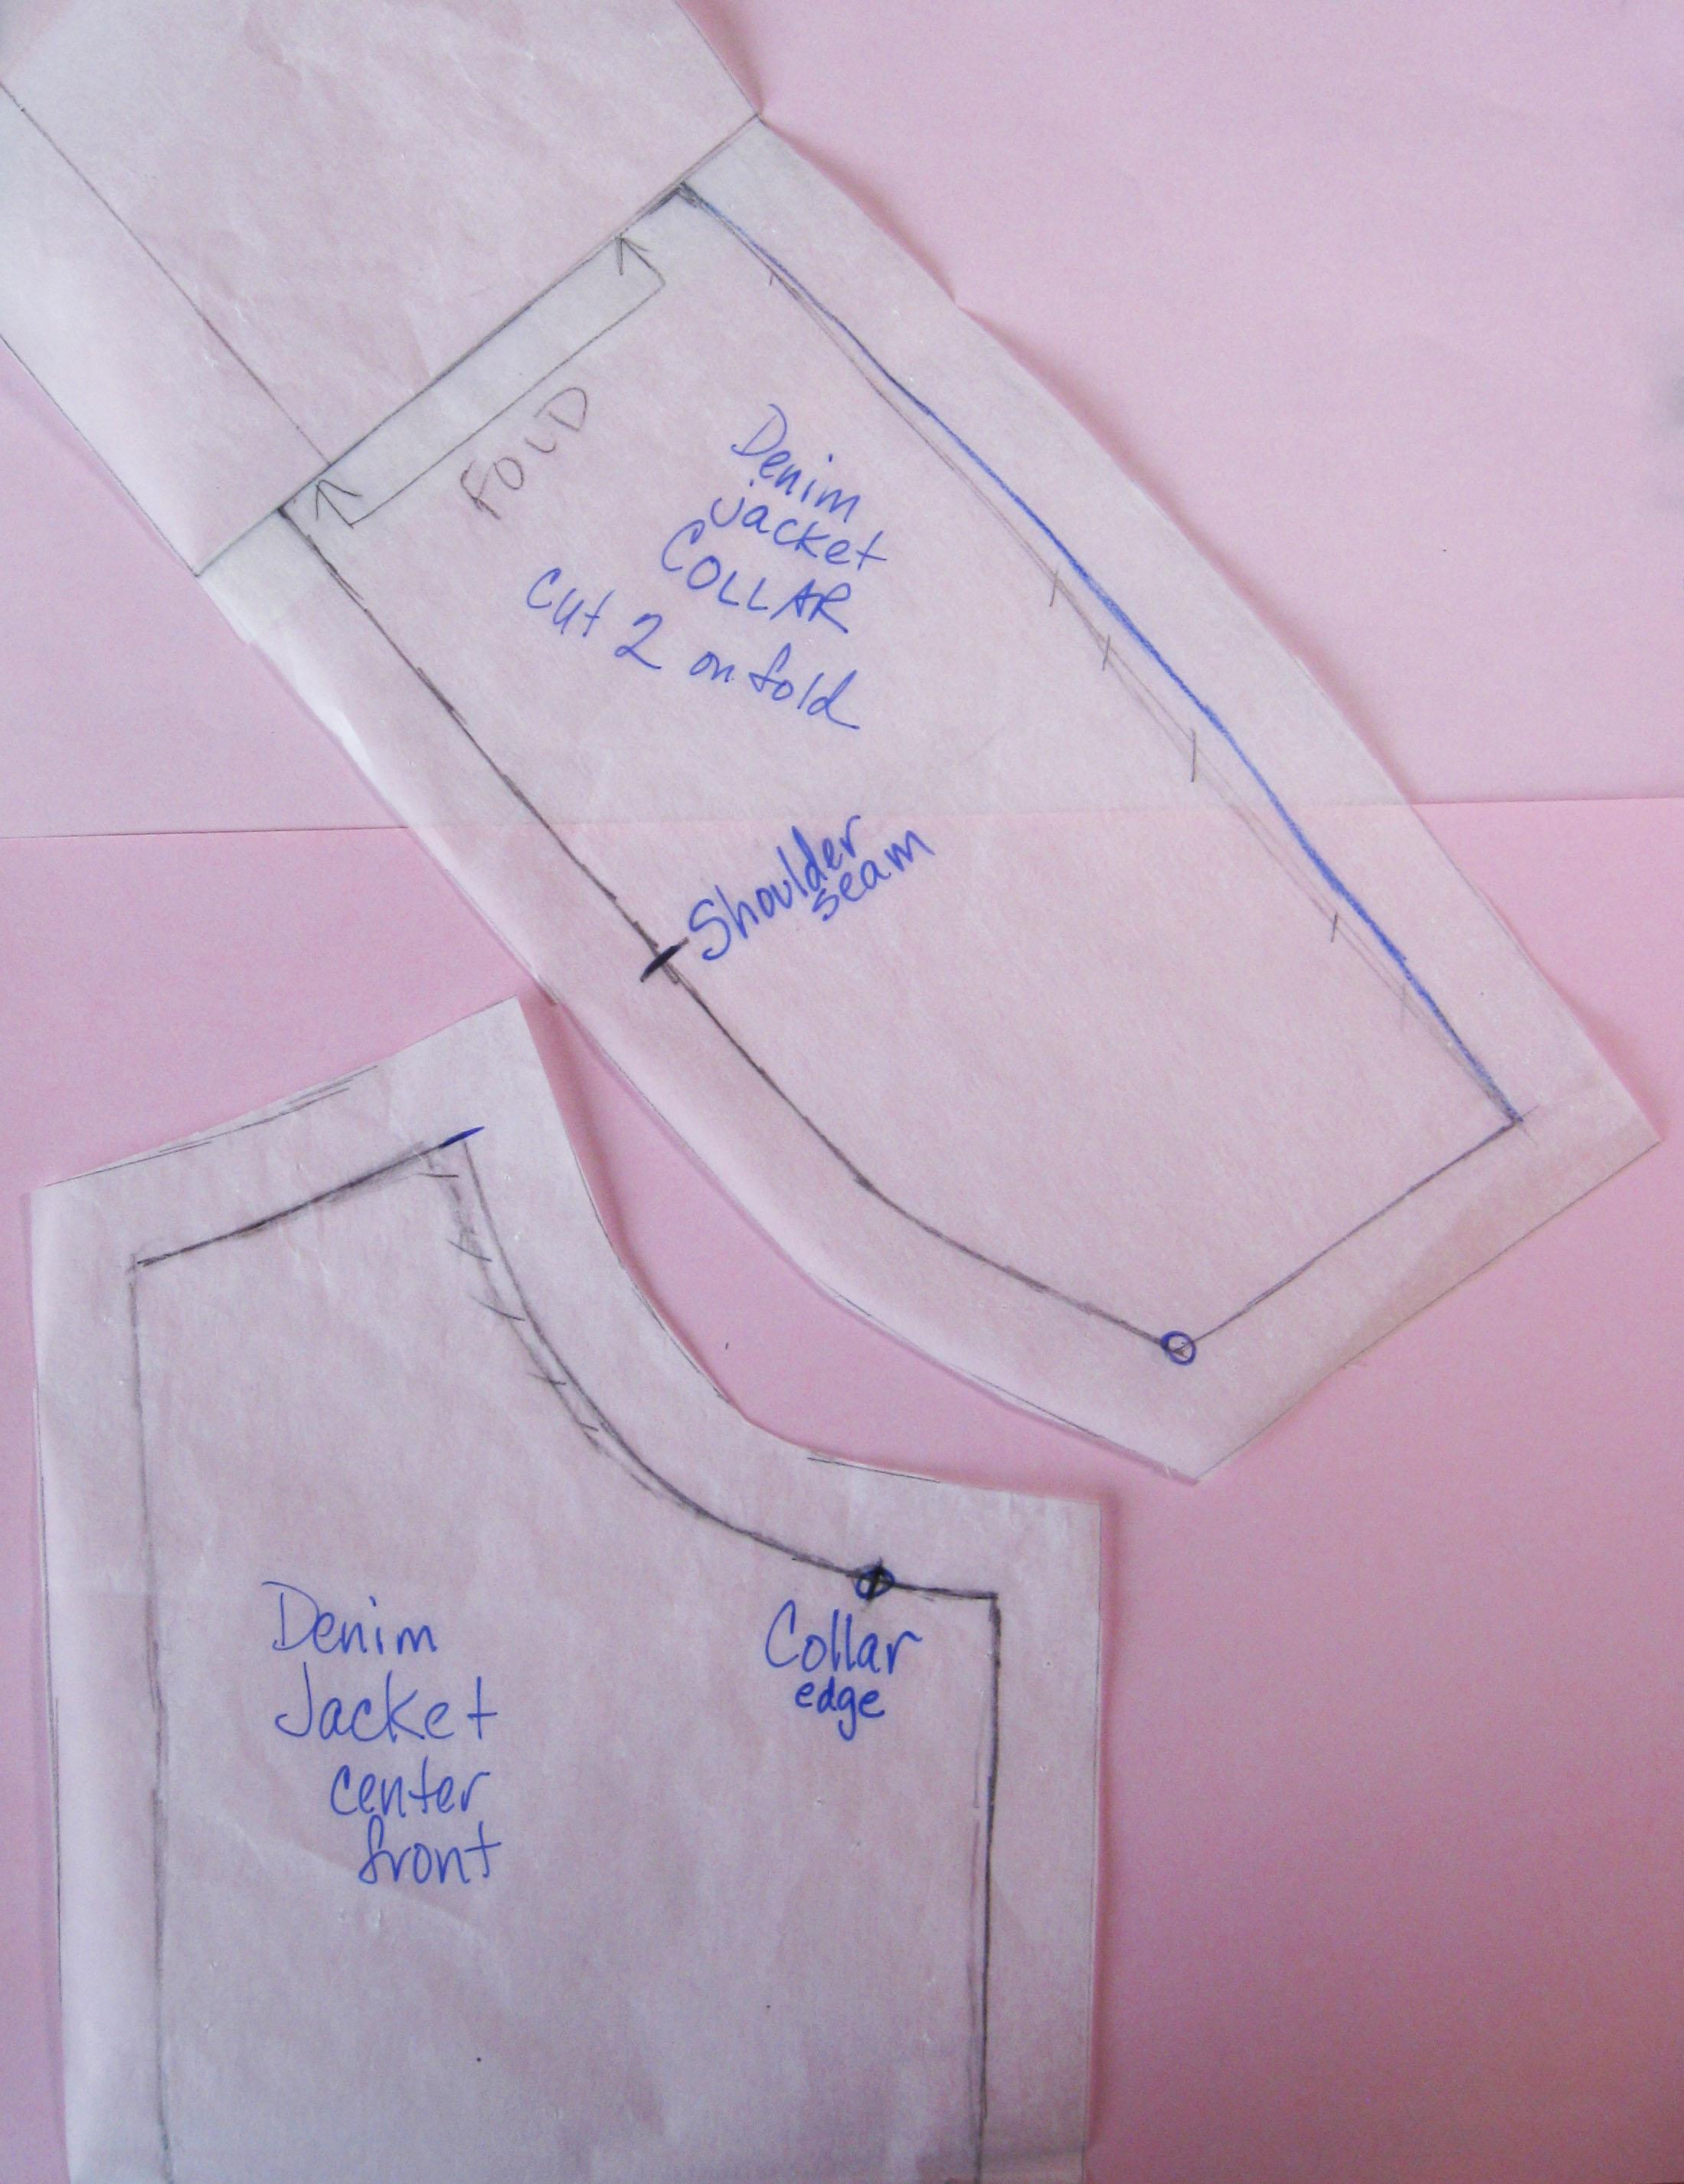 jacket pattern pieces